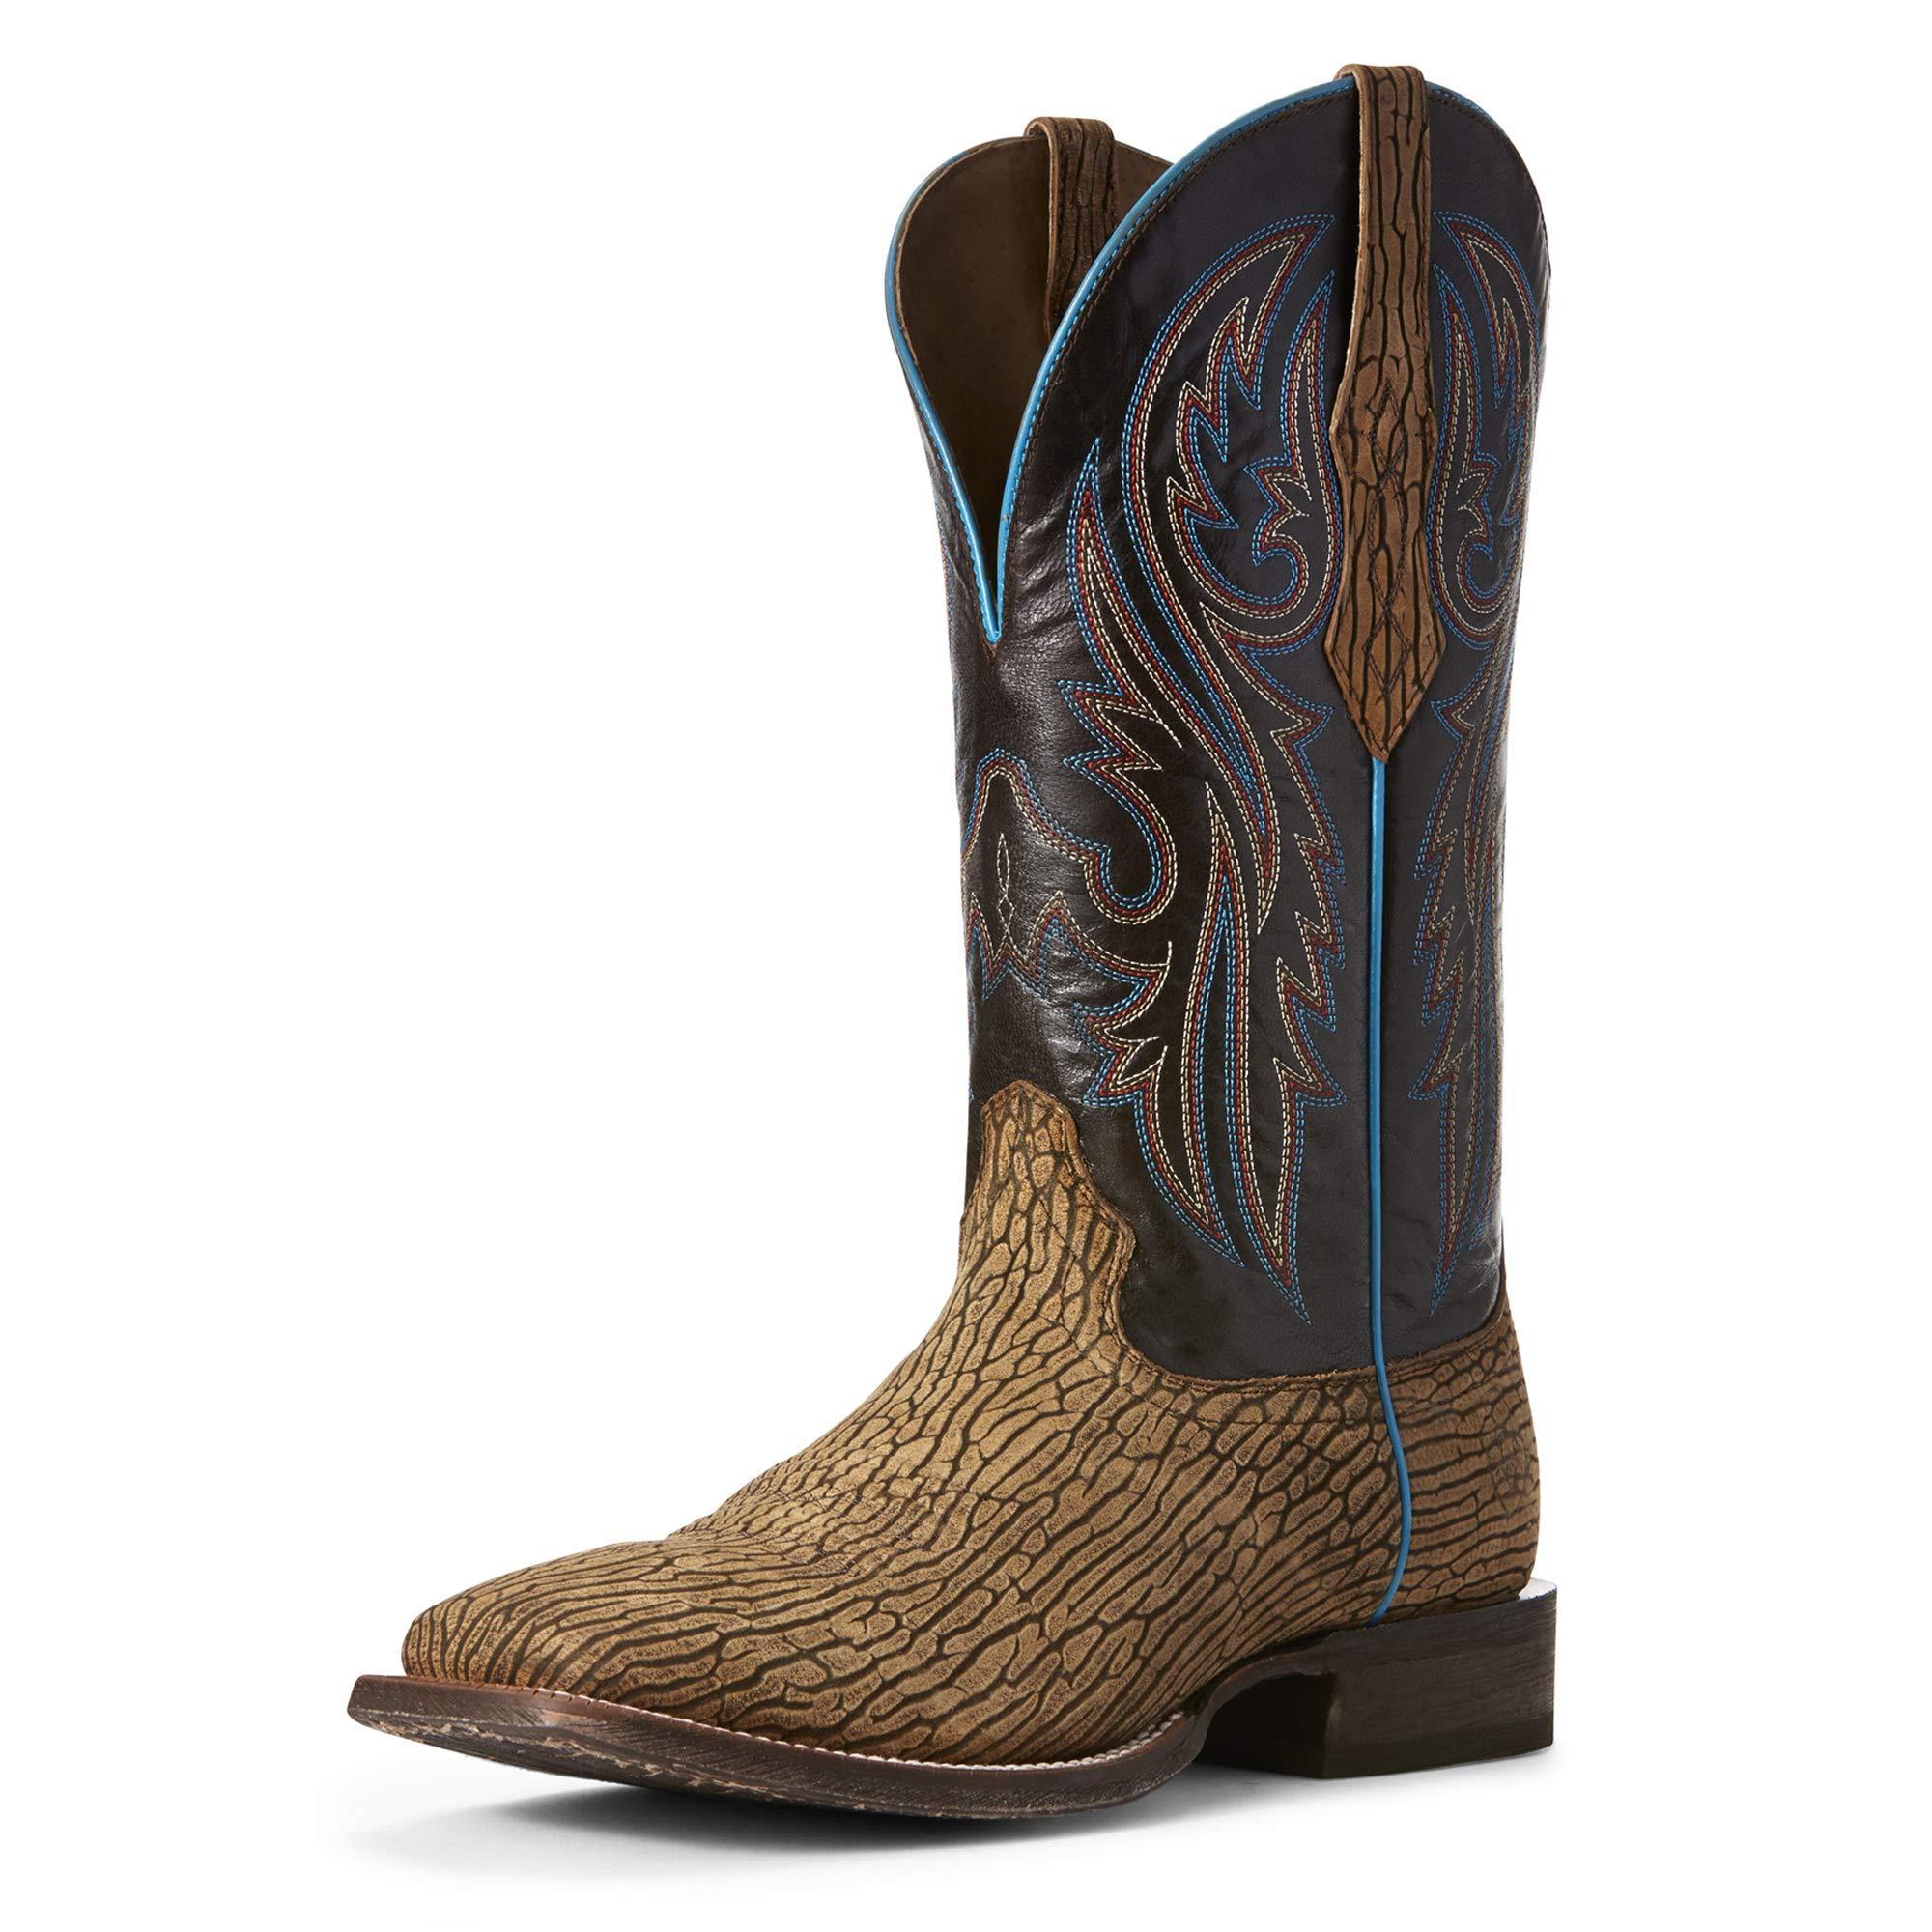 Ariat Men's Circuit Puncher Western Boot, Ancient Oak/Burbon Chocolate, 12D by ARIAT